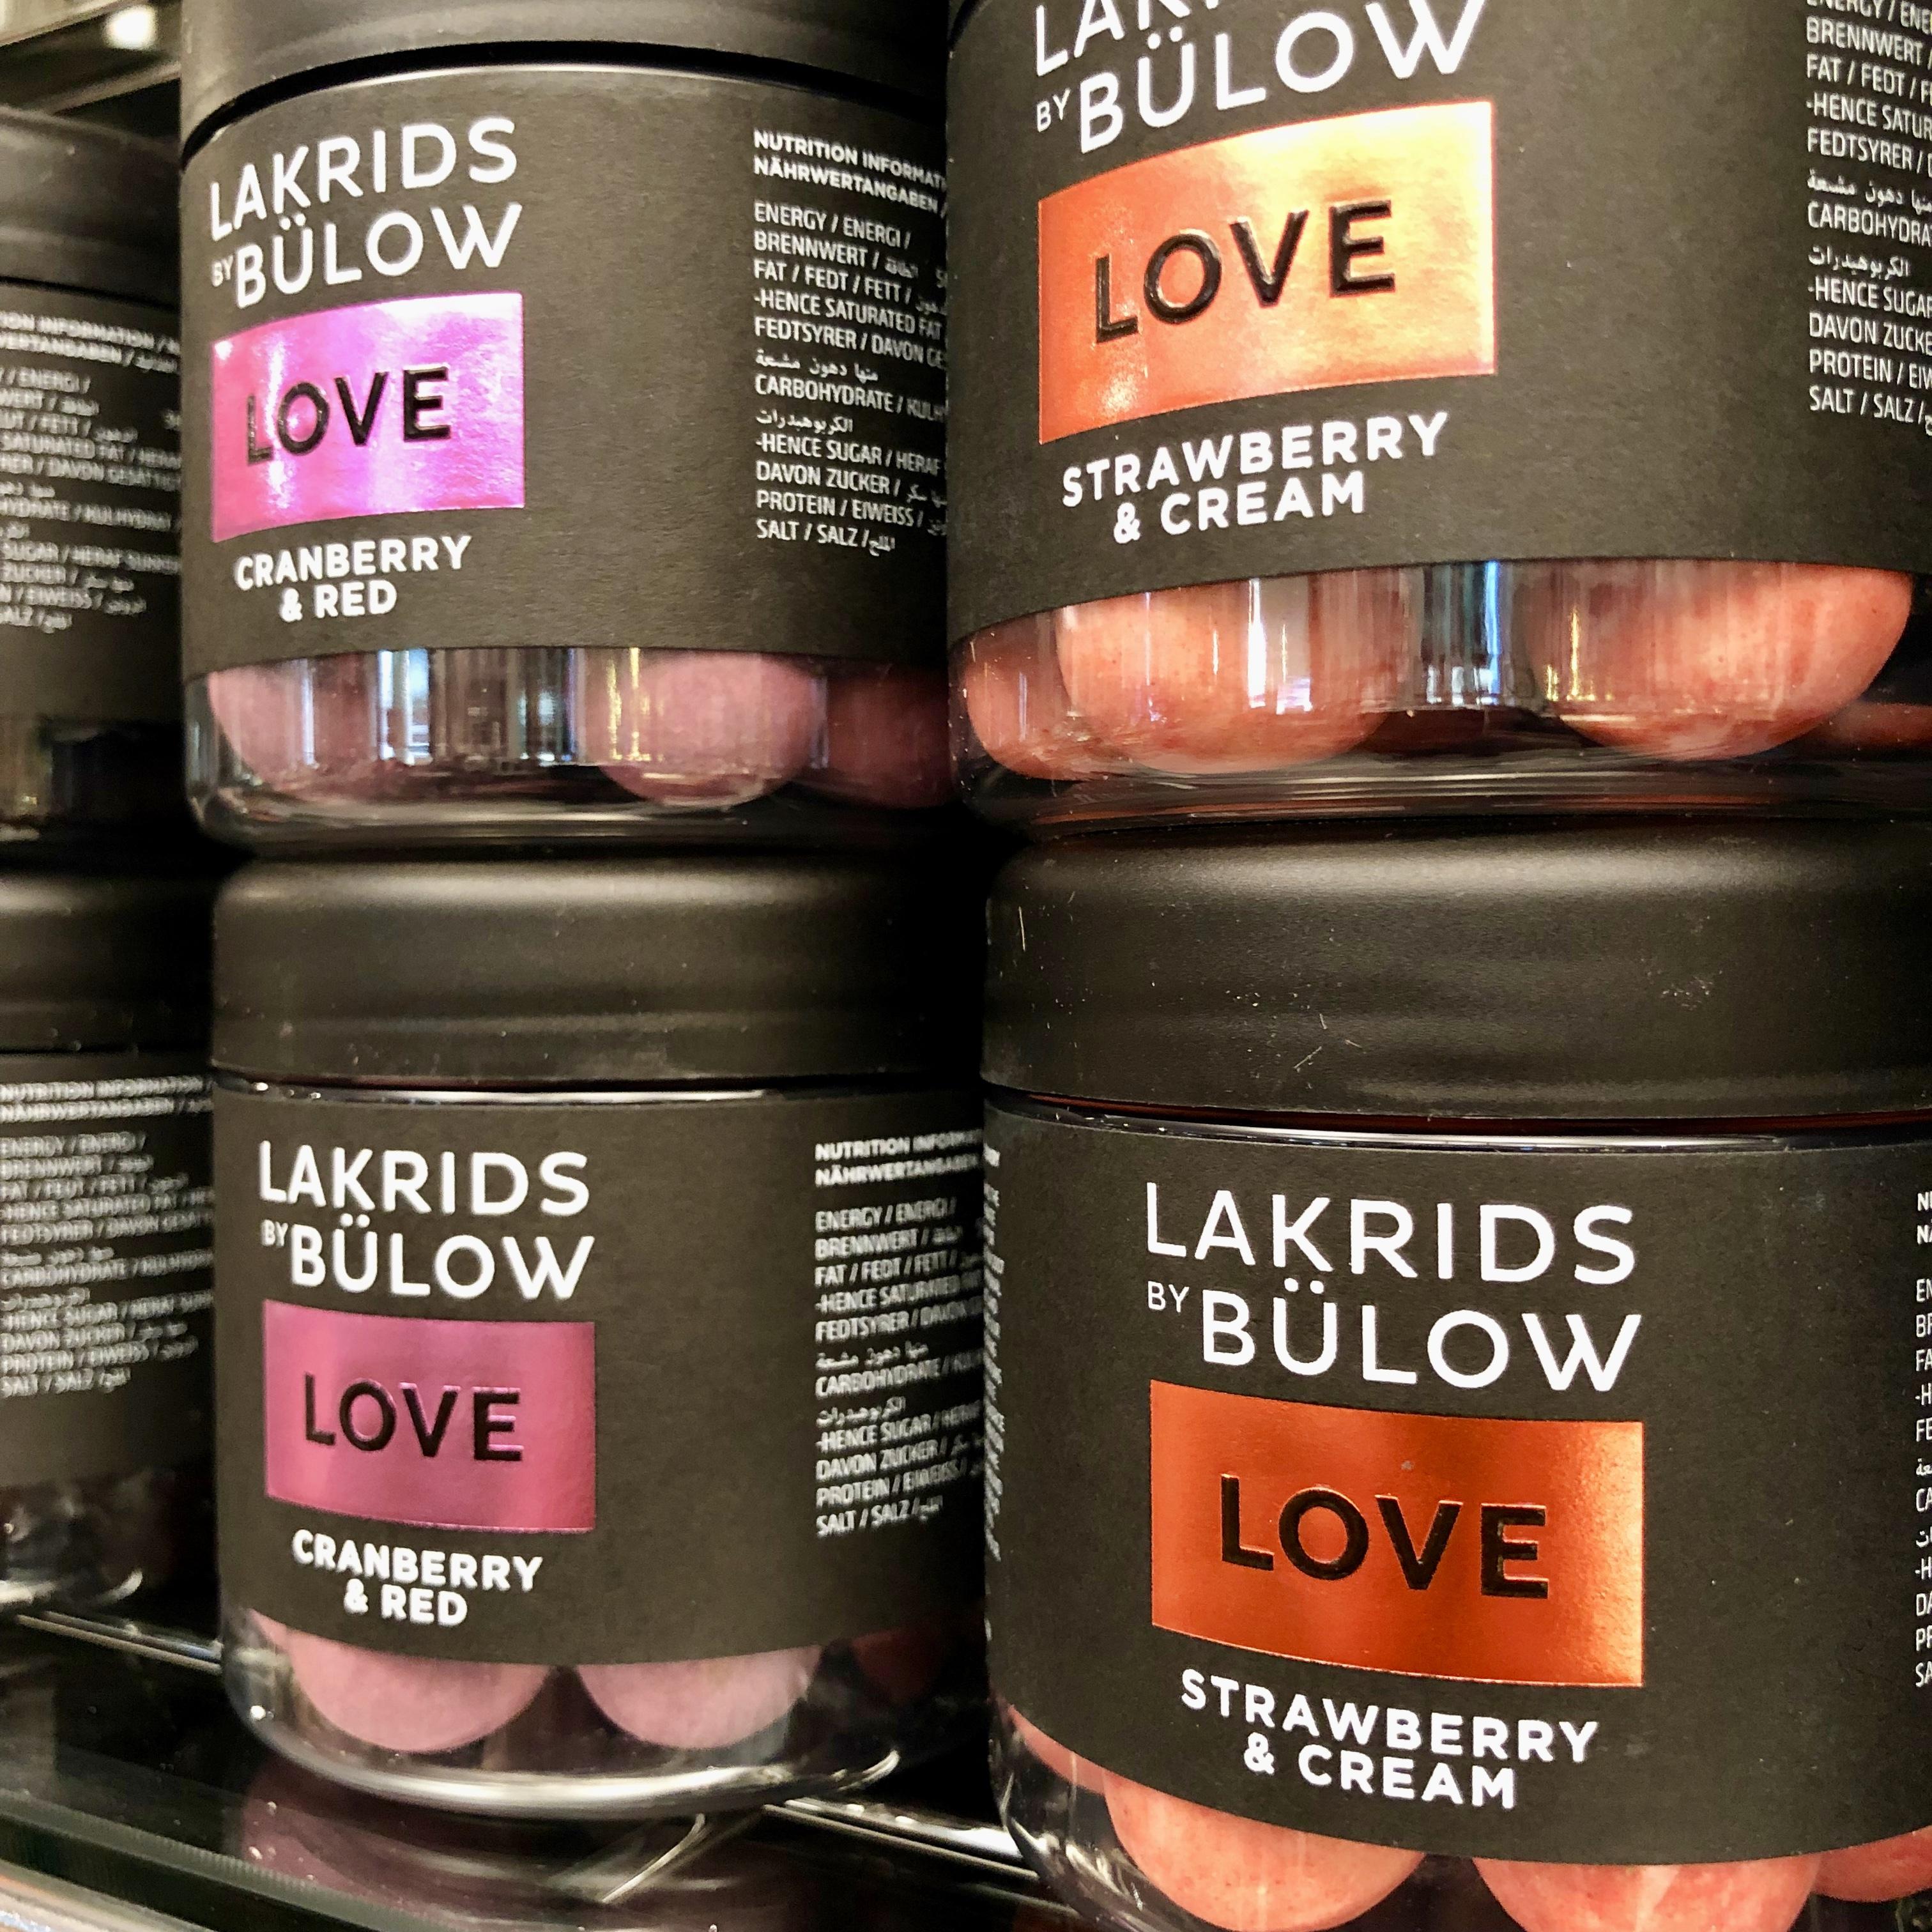 Lakrids Love 2019